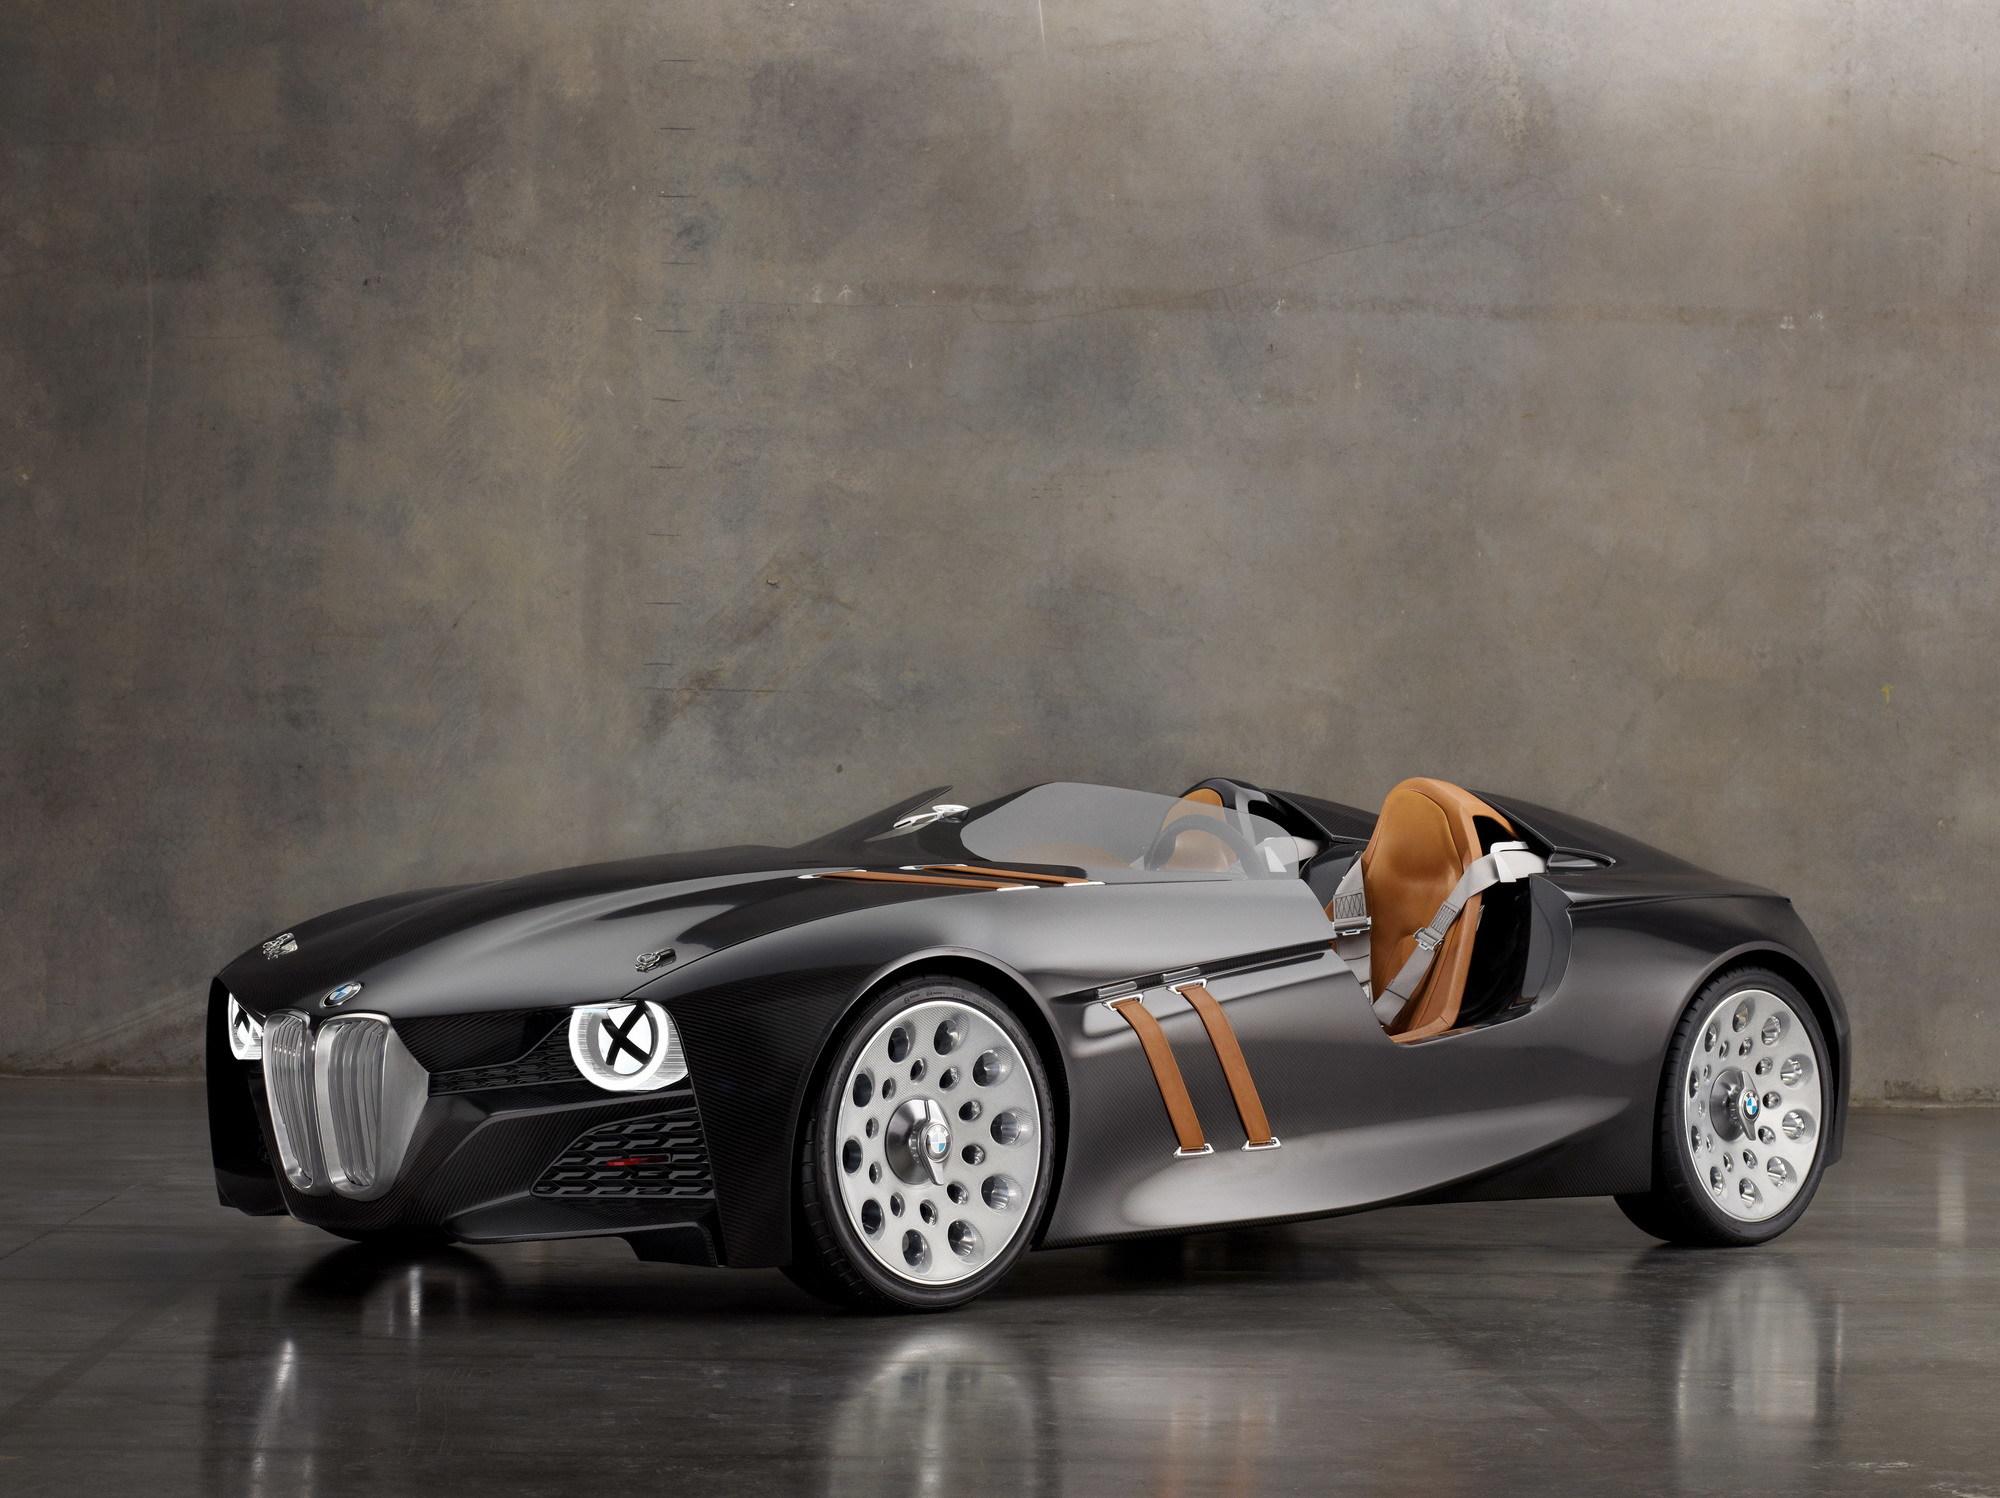 Картинка: Концепт-кар, BMW, 328, Hommage, стиль, 2011